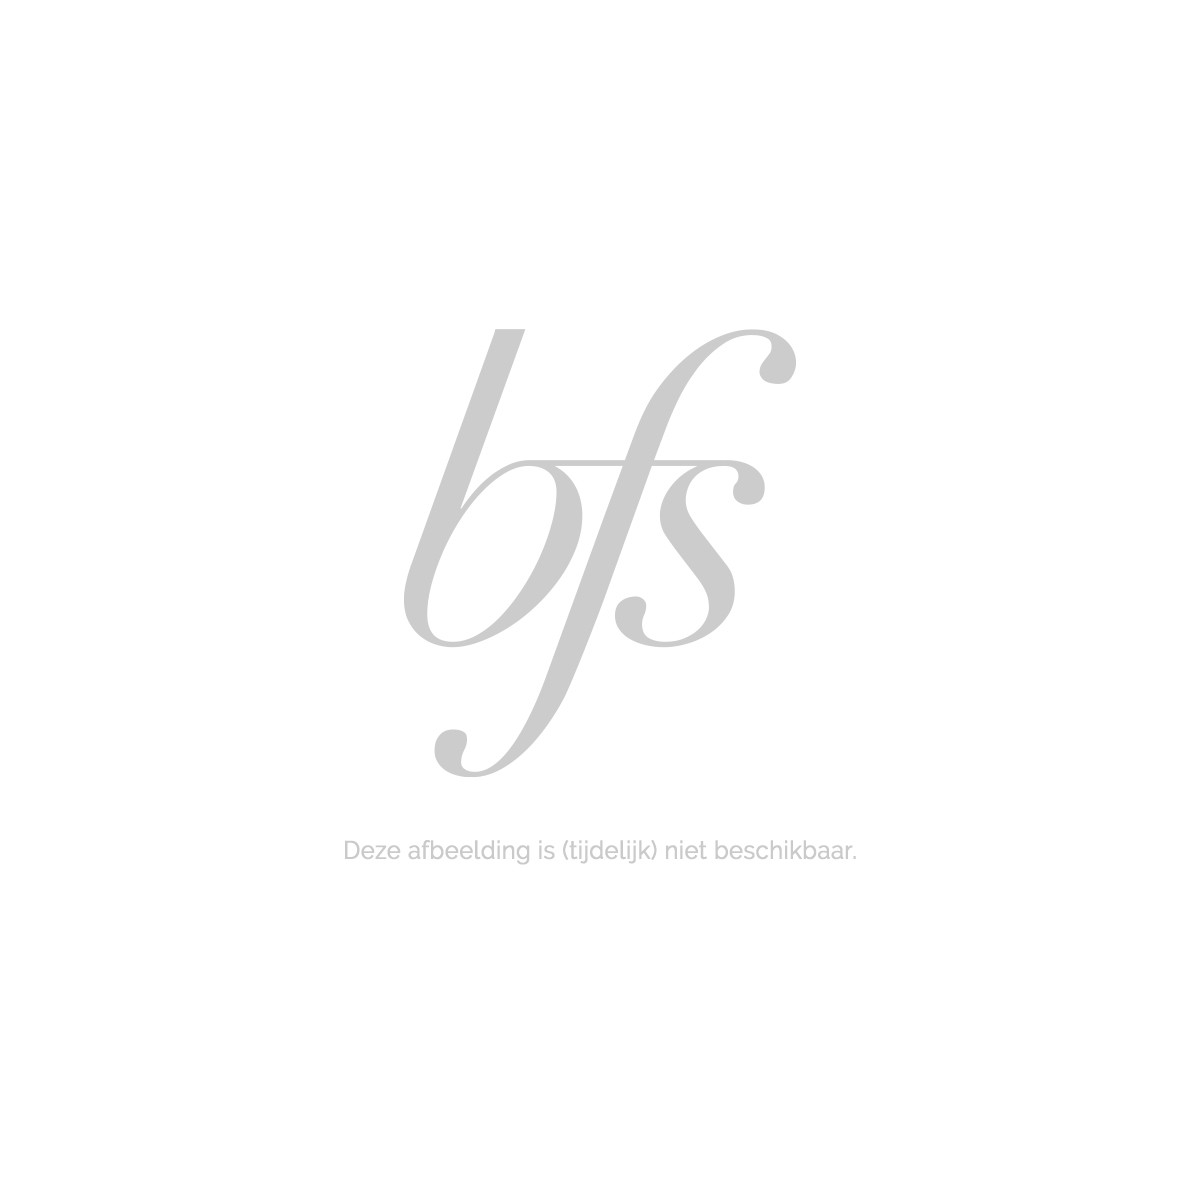 Sensai Luminous Sheer Foundation Spf15 #204.5 Warm Beige 30 Ml